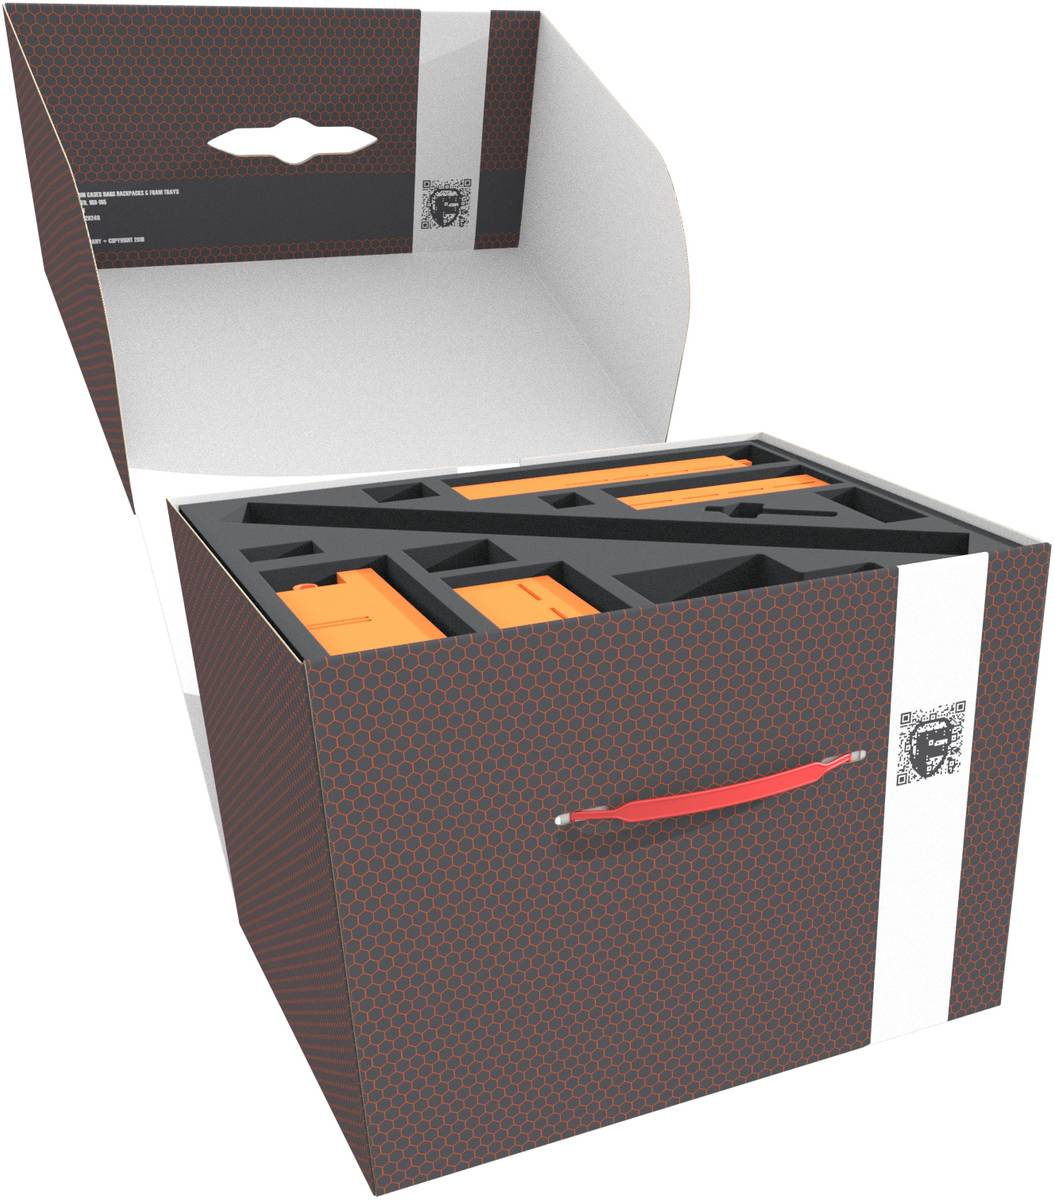 Feldherr Storage Box FSLB250 with Token Holder Set for U-BOOT The Board Game